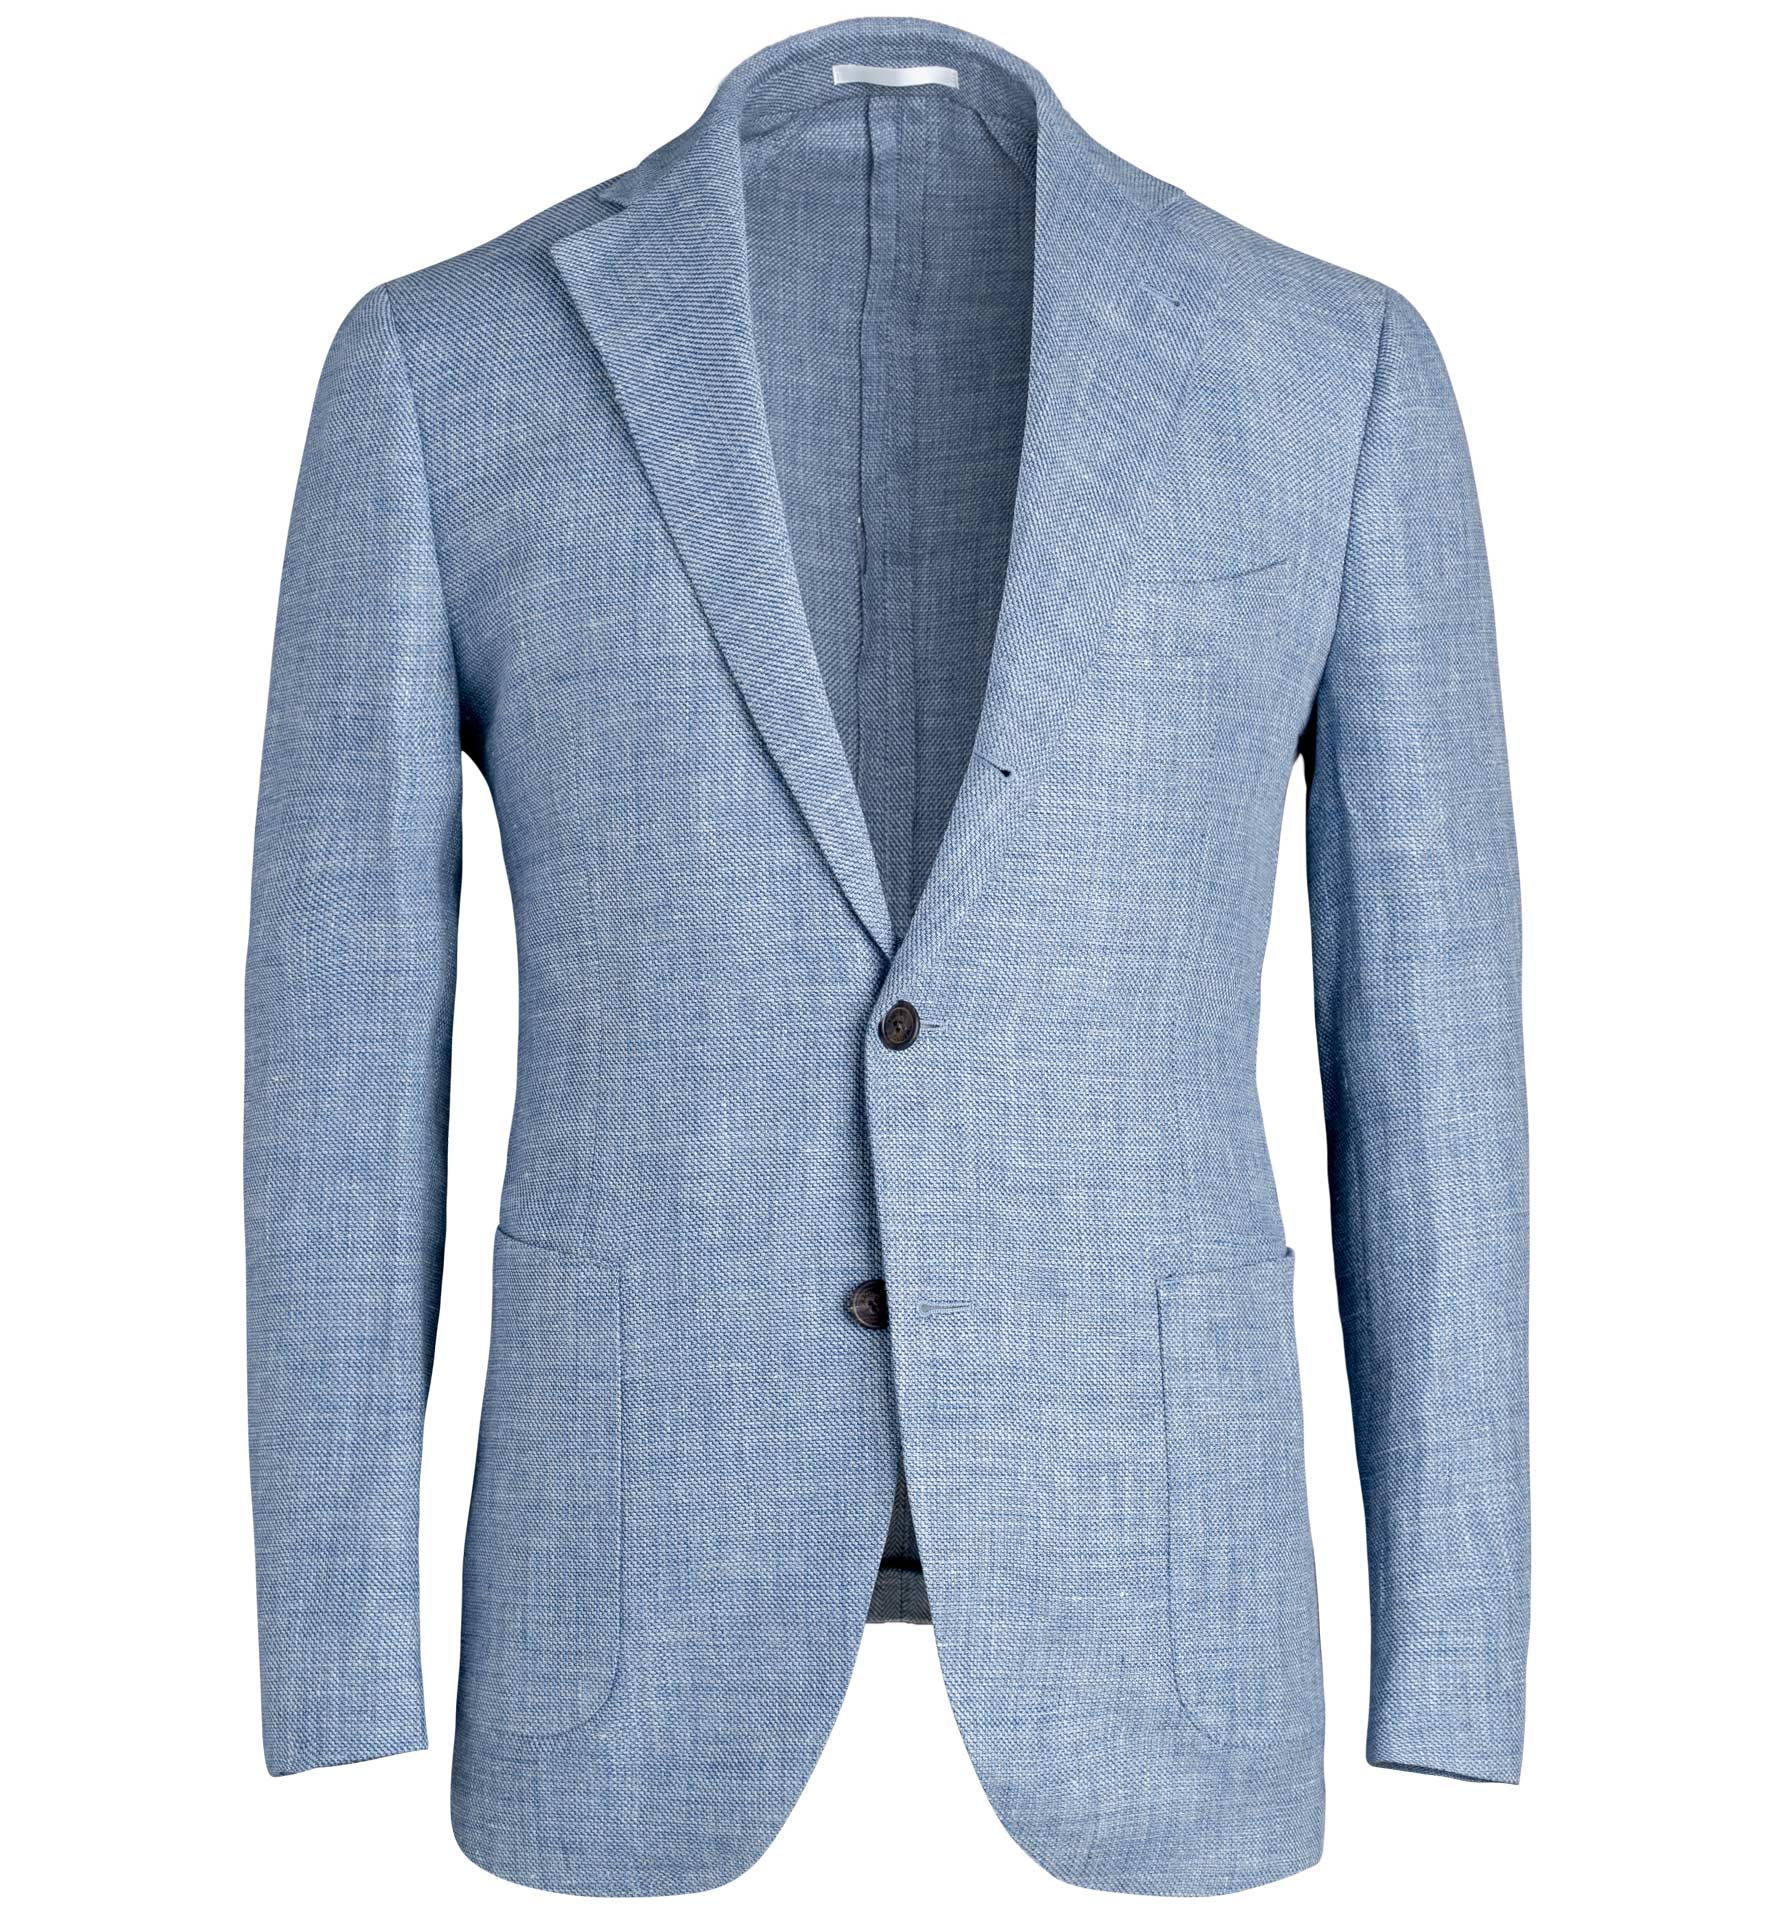 Zoom Image of Bedford Sky Blue Wool and Linen Hopsack Jacket